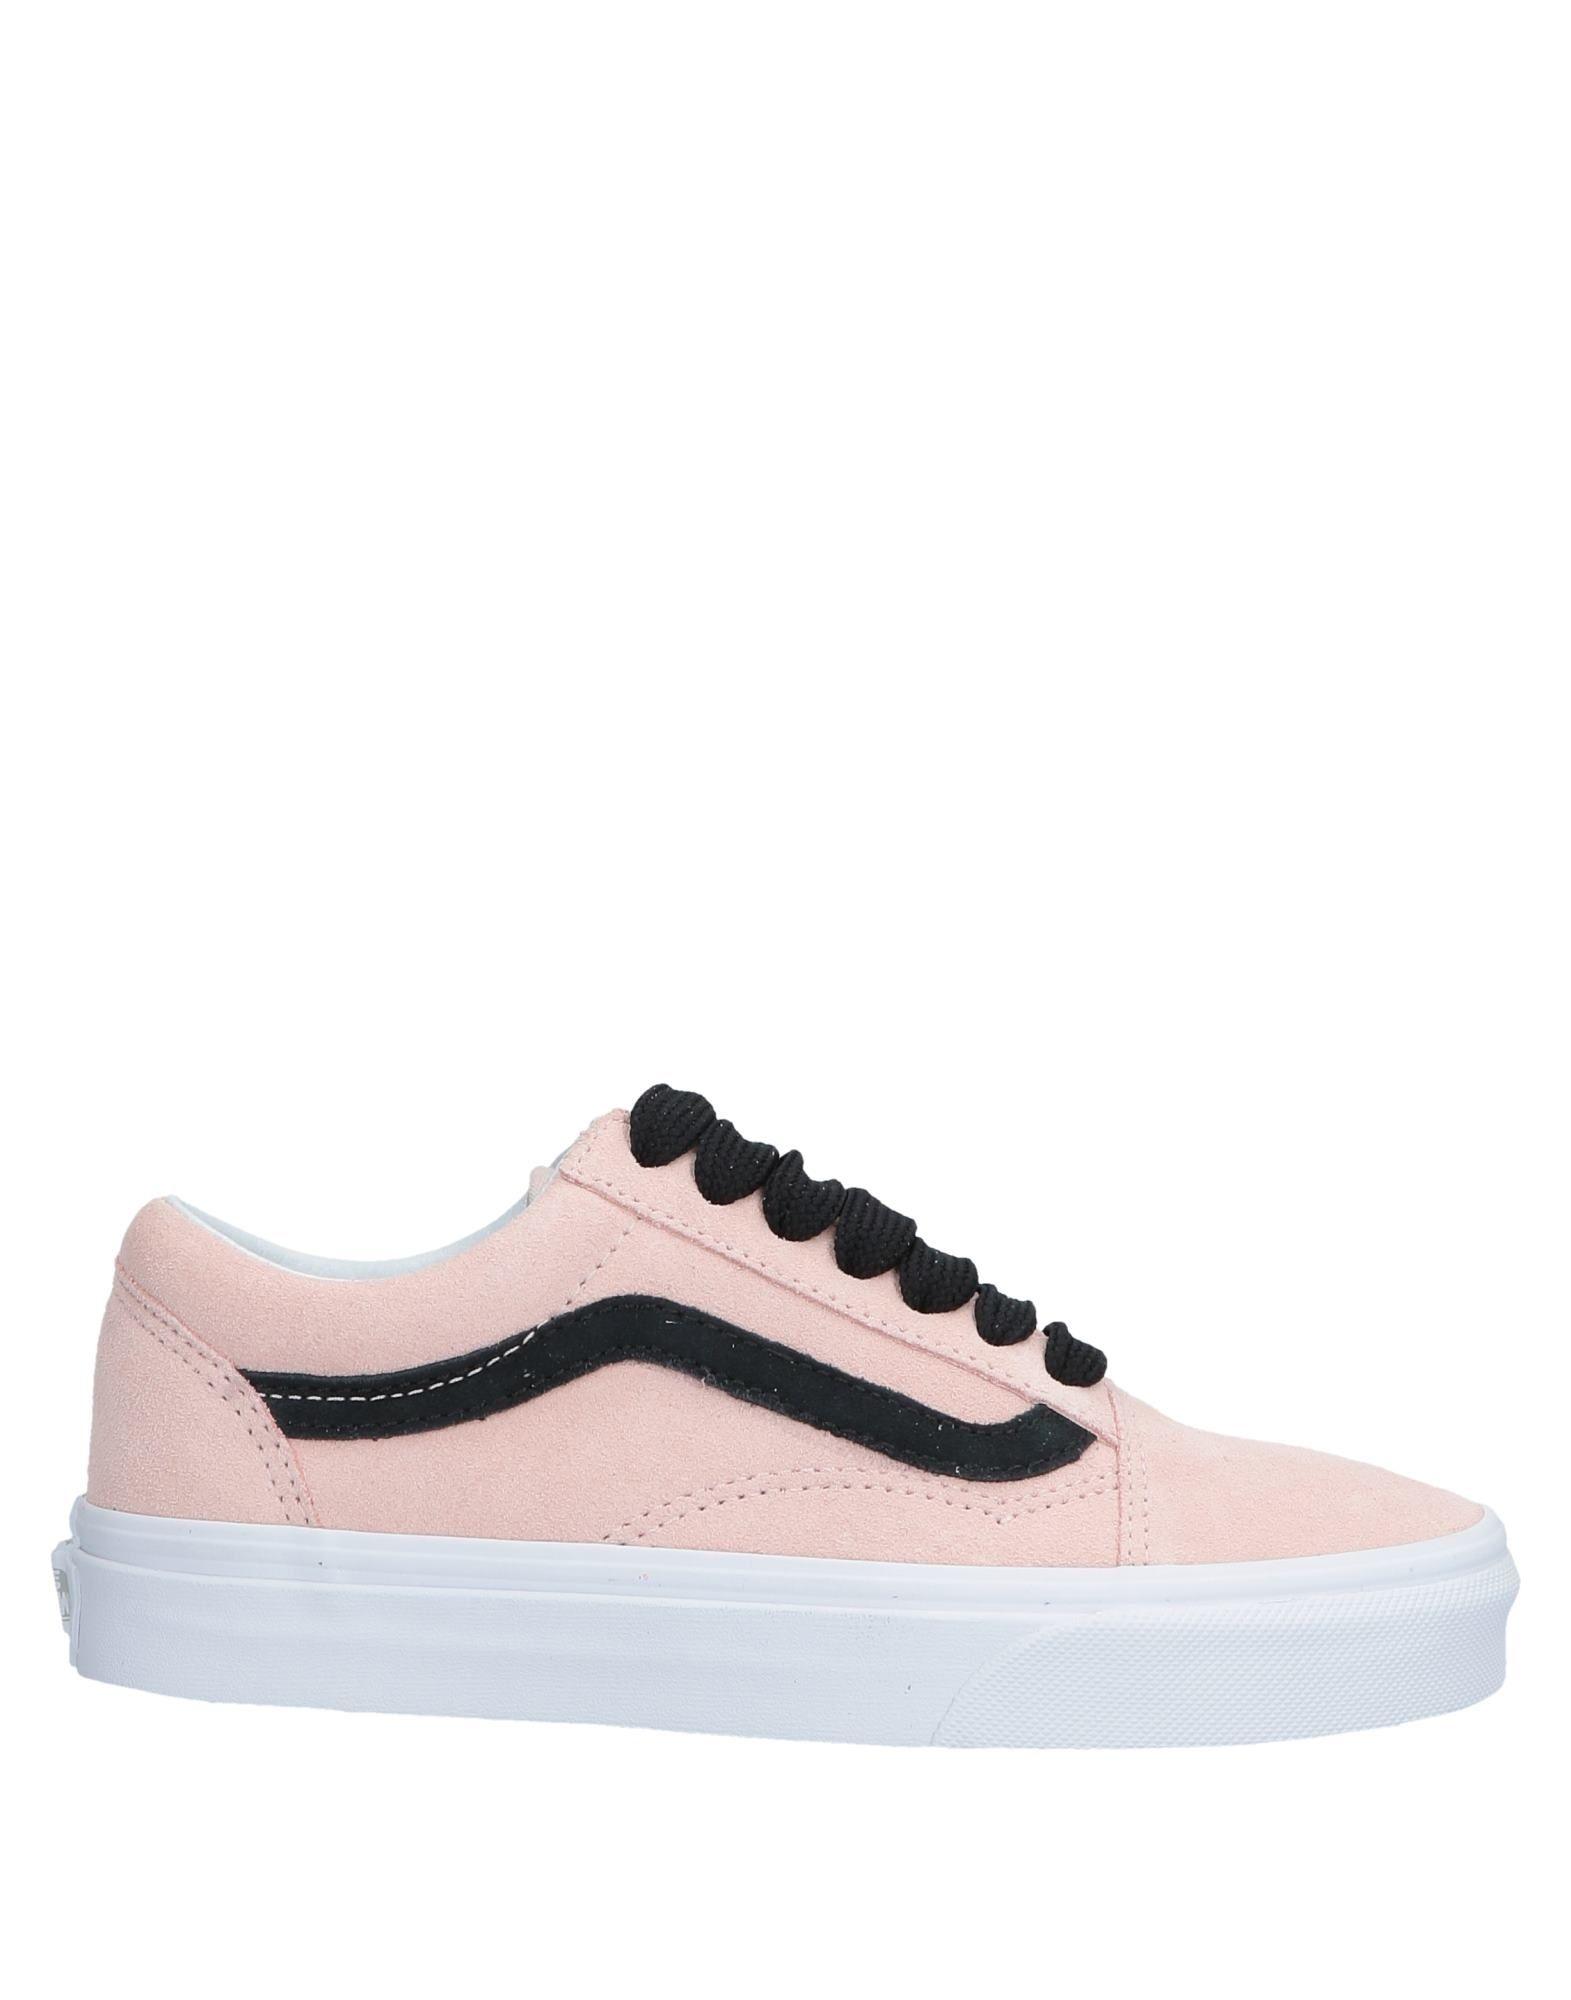 Vans Turnschuhes Damen 11573841VP Gute Qualität beliebte Schuhe